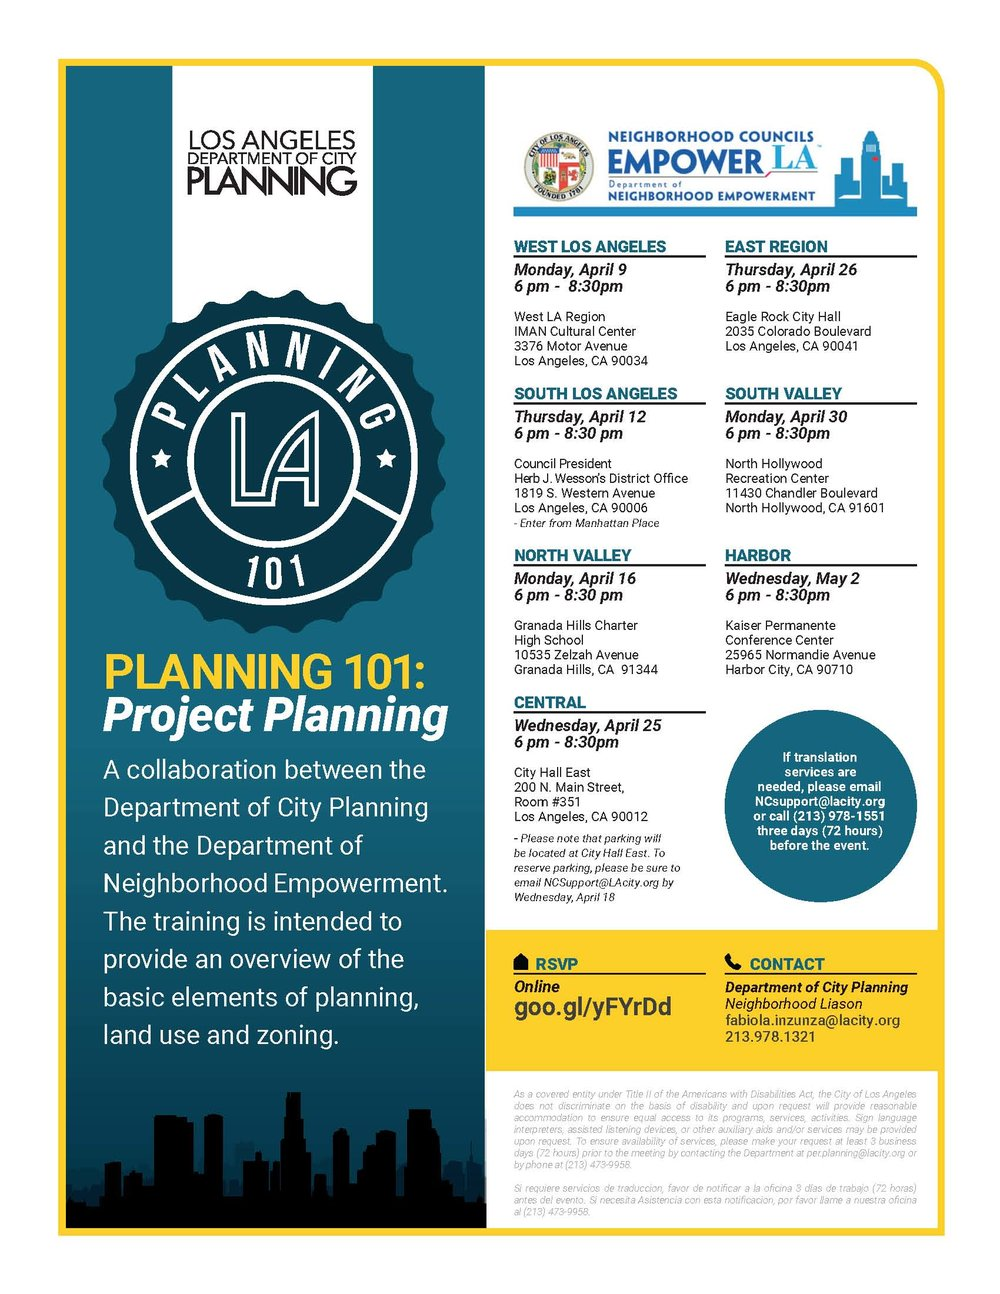 P101-ProjectPlanning-Spring2018_Flyer (3).jpg